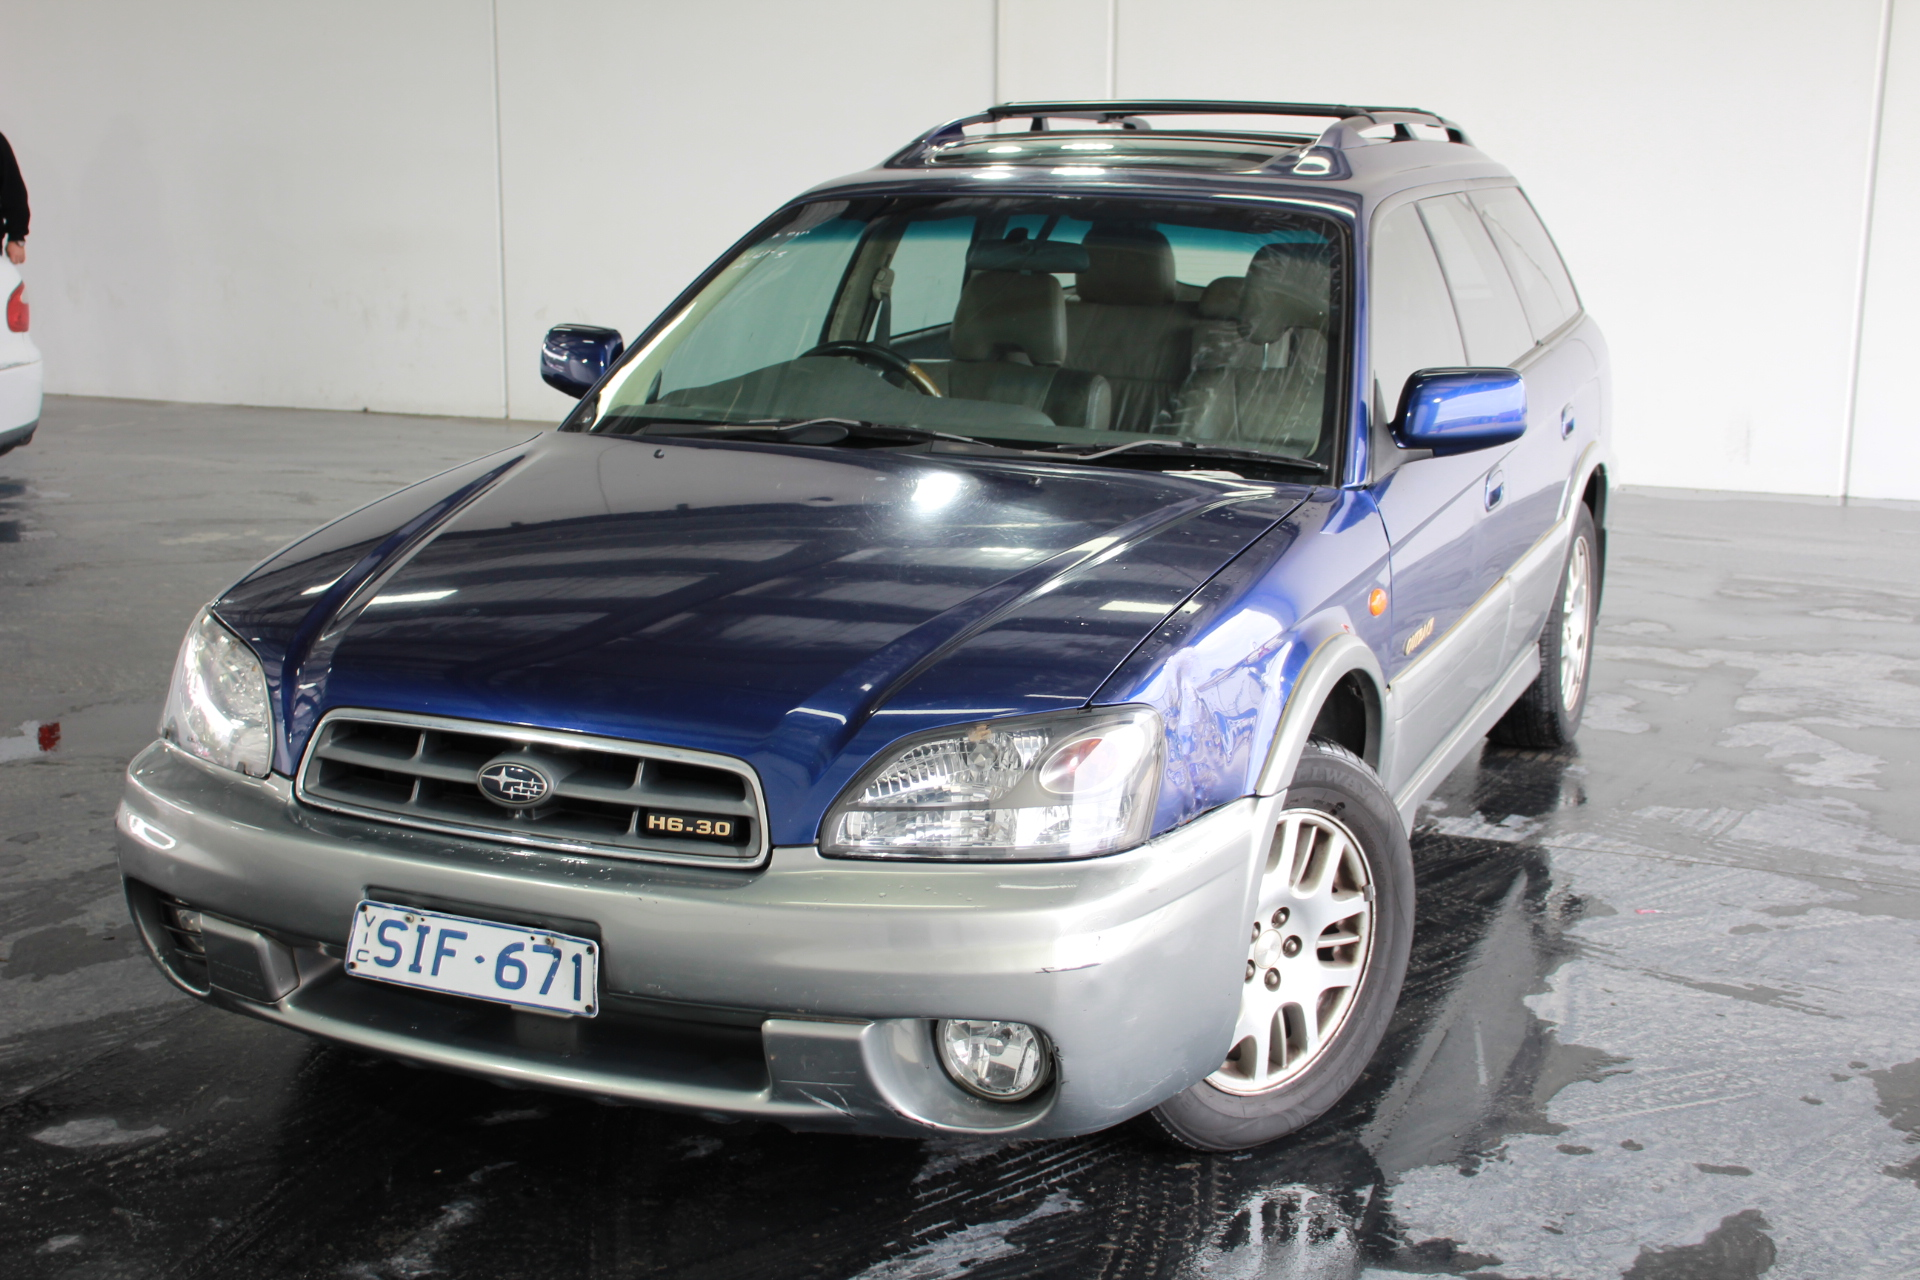 2003 Subaru Outback H6 LUXURY B3A Automatic Wagon